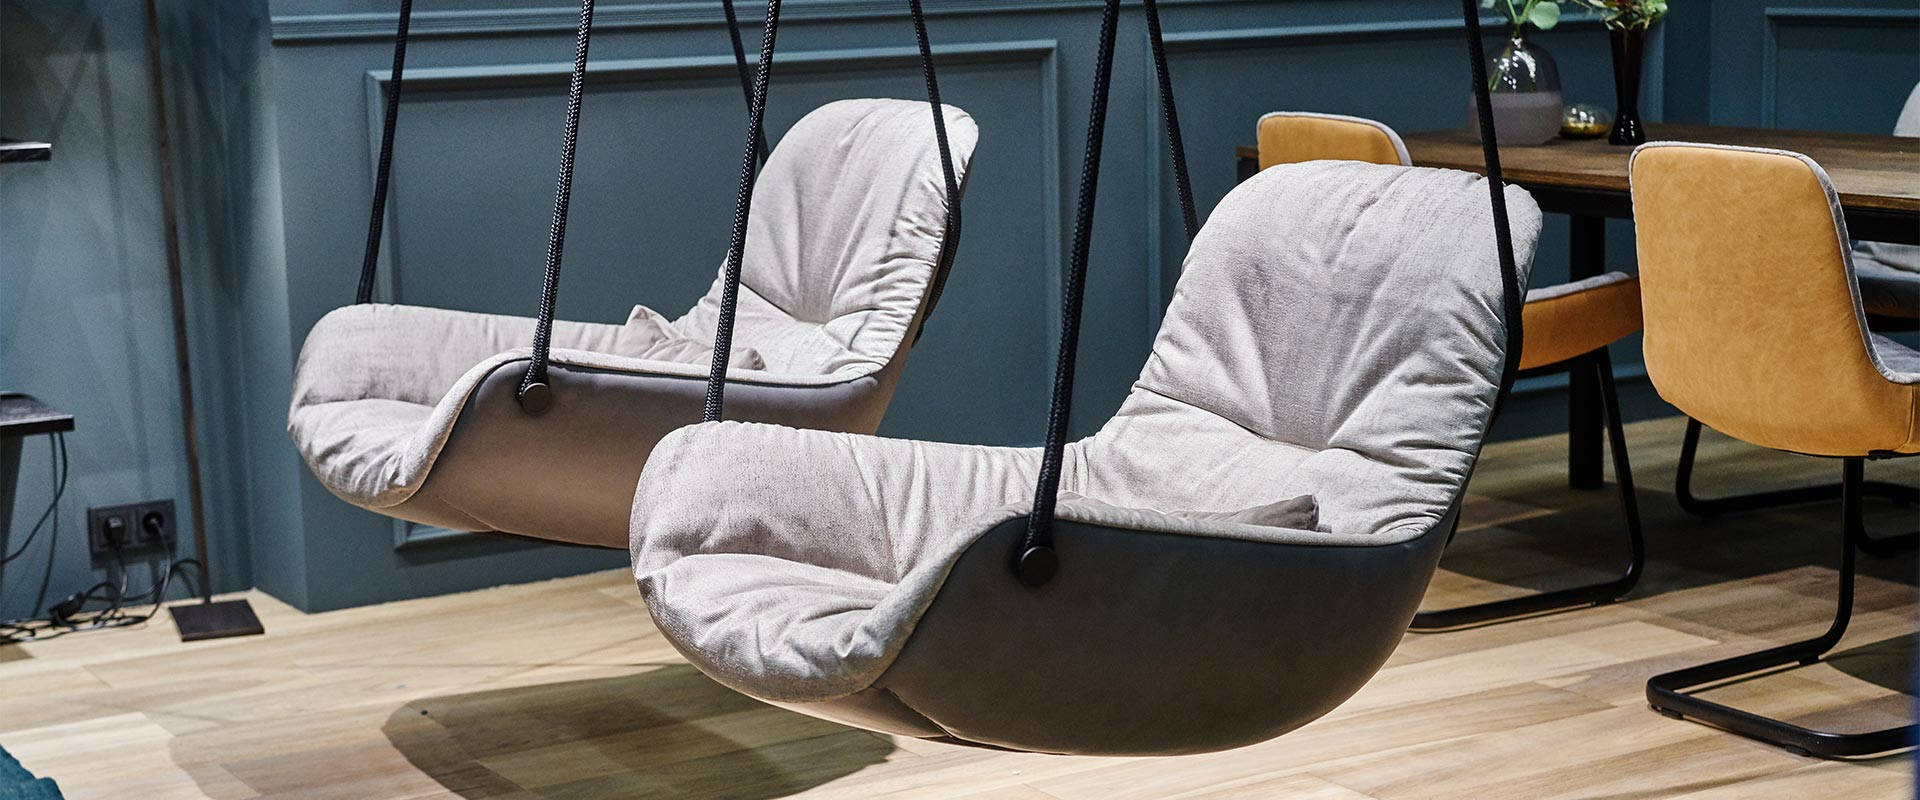 IMM Köln Messestand - Freifrau Leya Swing Seat